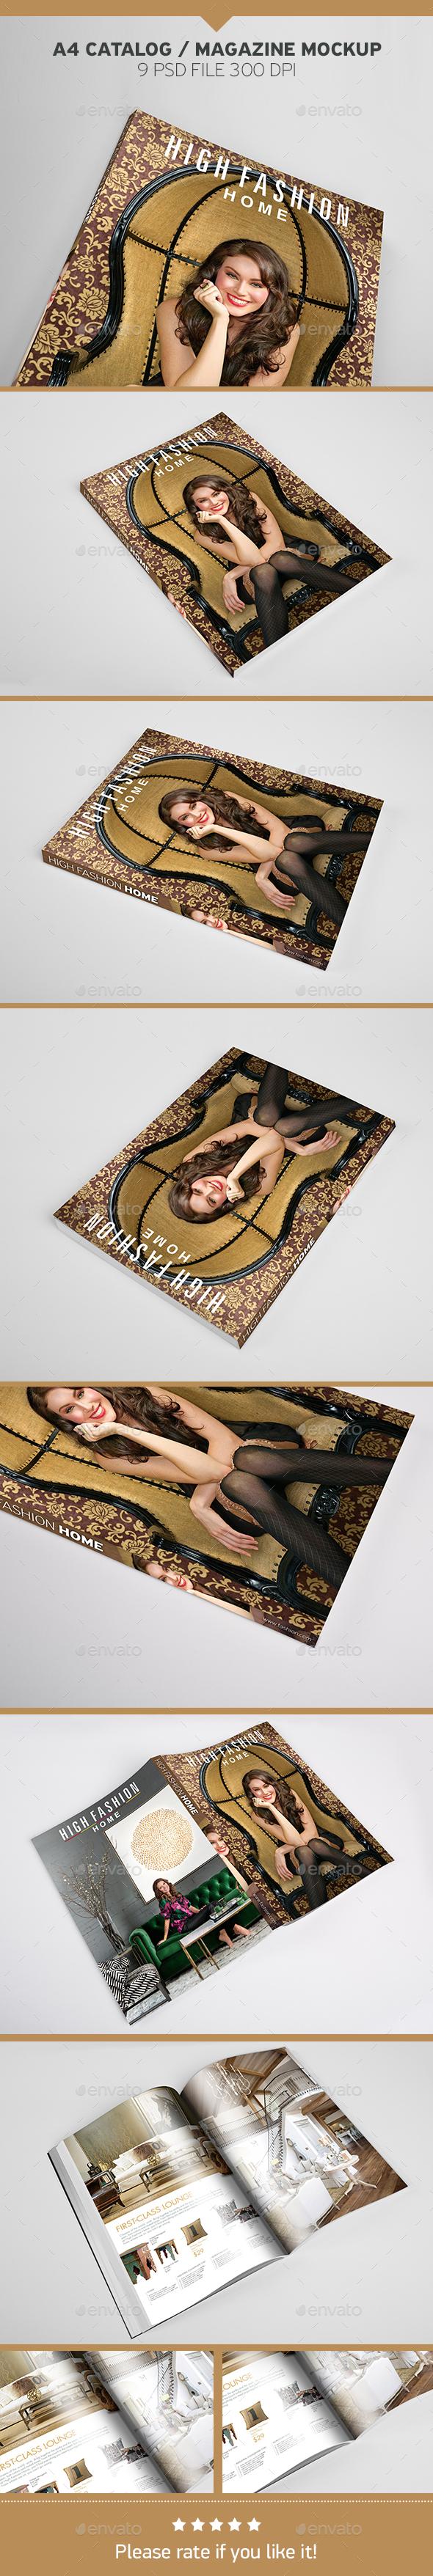 A4 Catalog / Magazine Mockup - Magazines Print